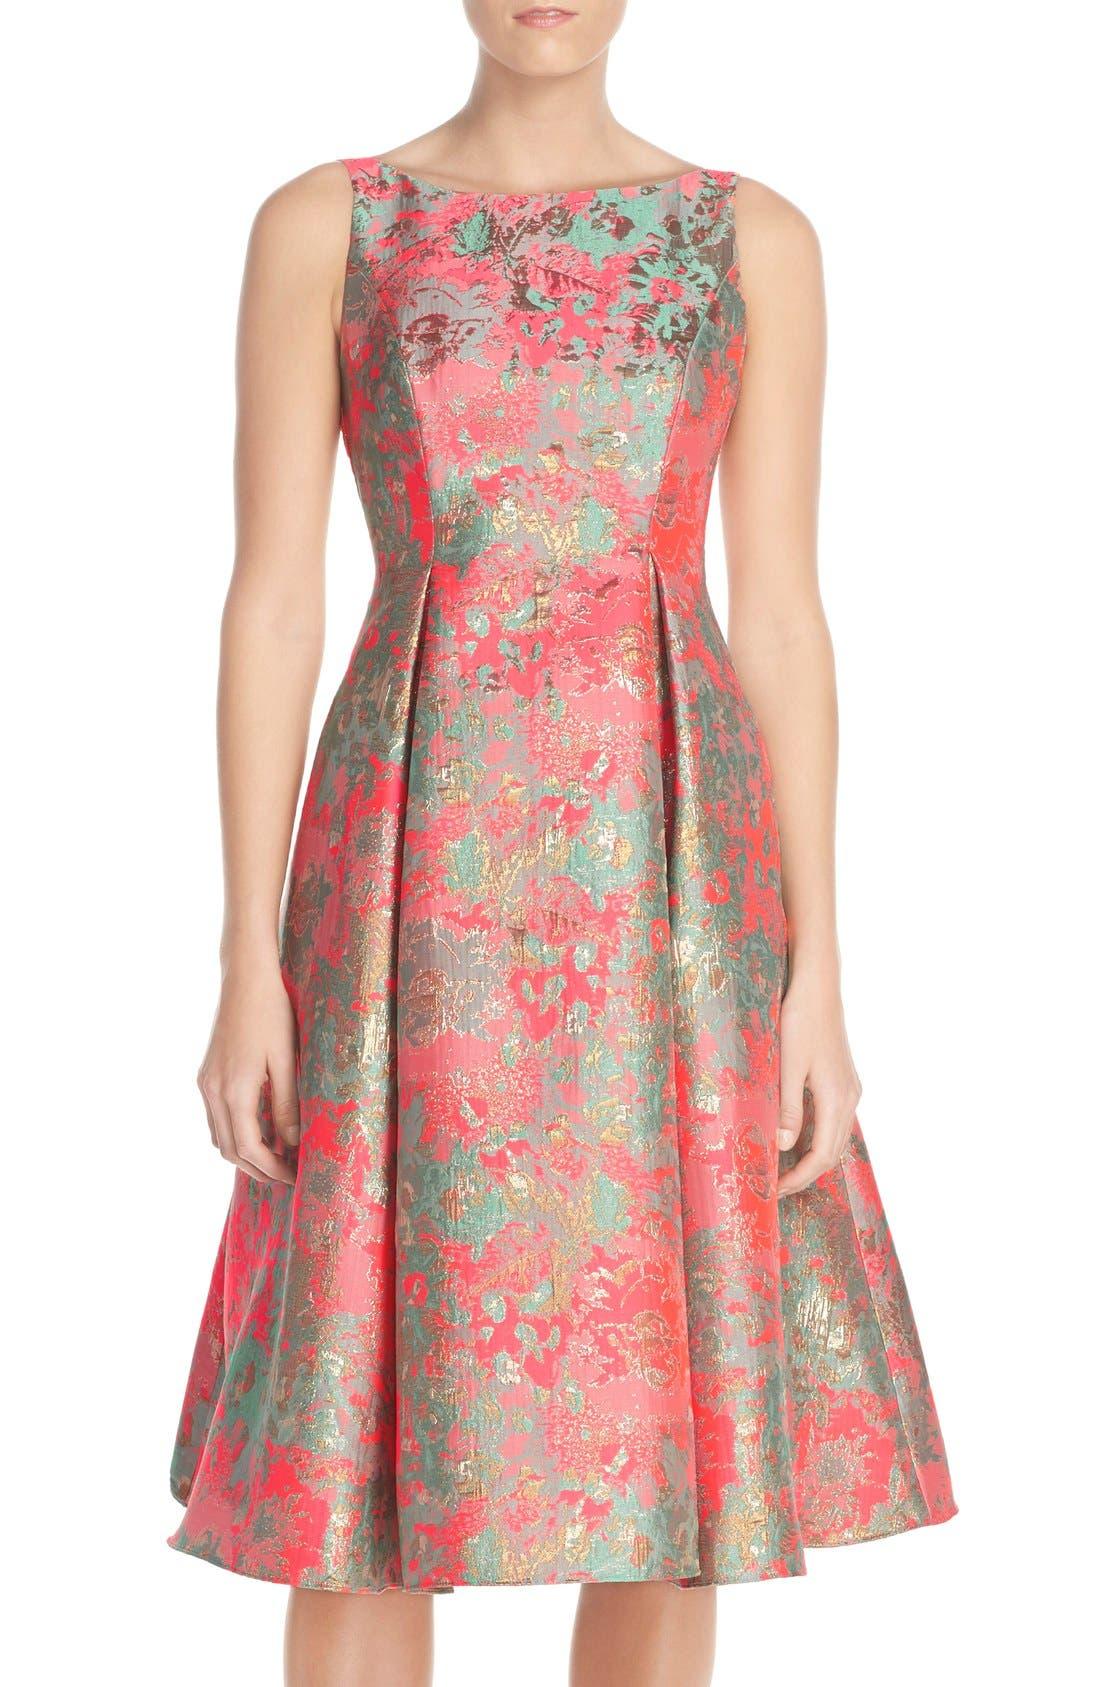 Main Image - Adrianna Papell Metallic Jacquard Fit & Flare Dress